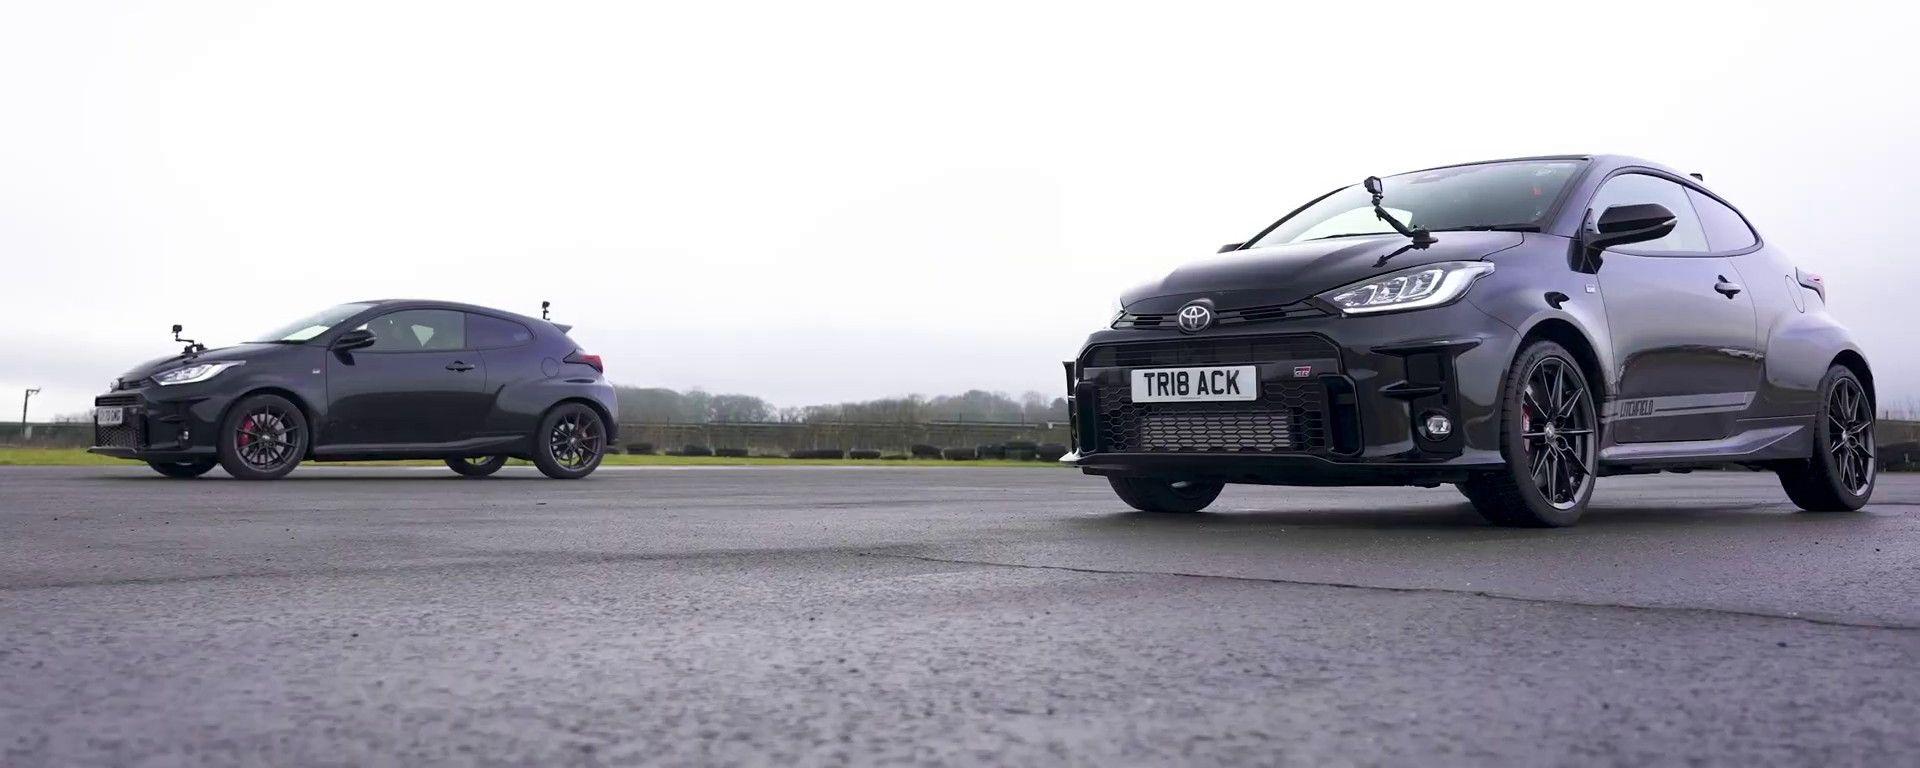 Toyota GR Yaris standard vs quella sottoposta a tuning da Litchfield